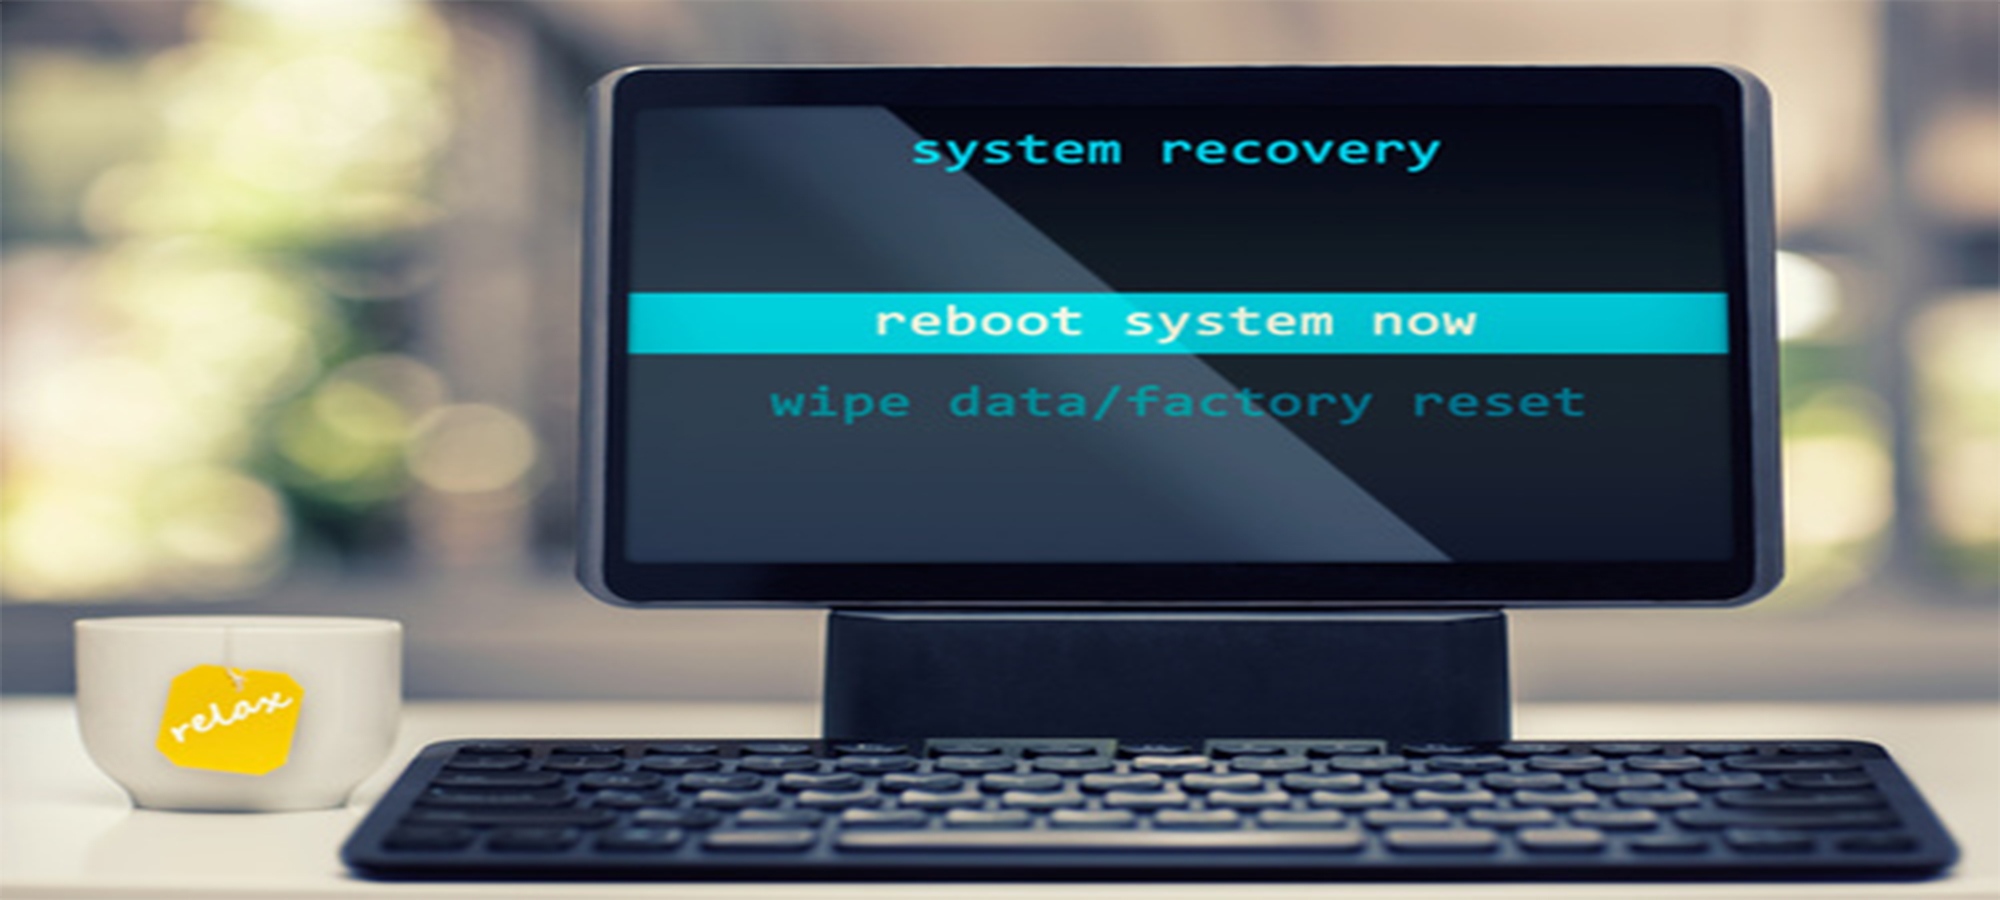 reboot_277998752_larger